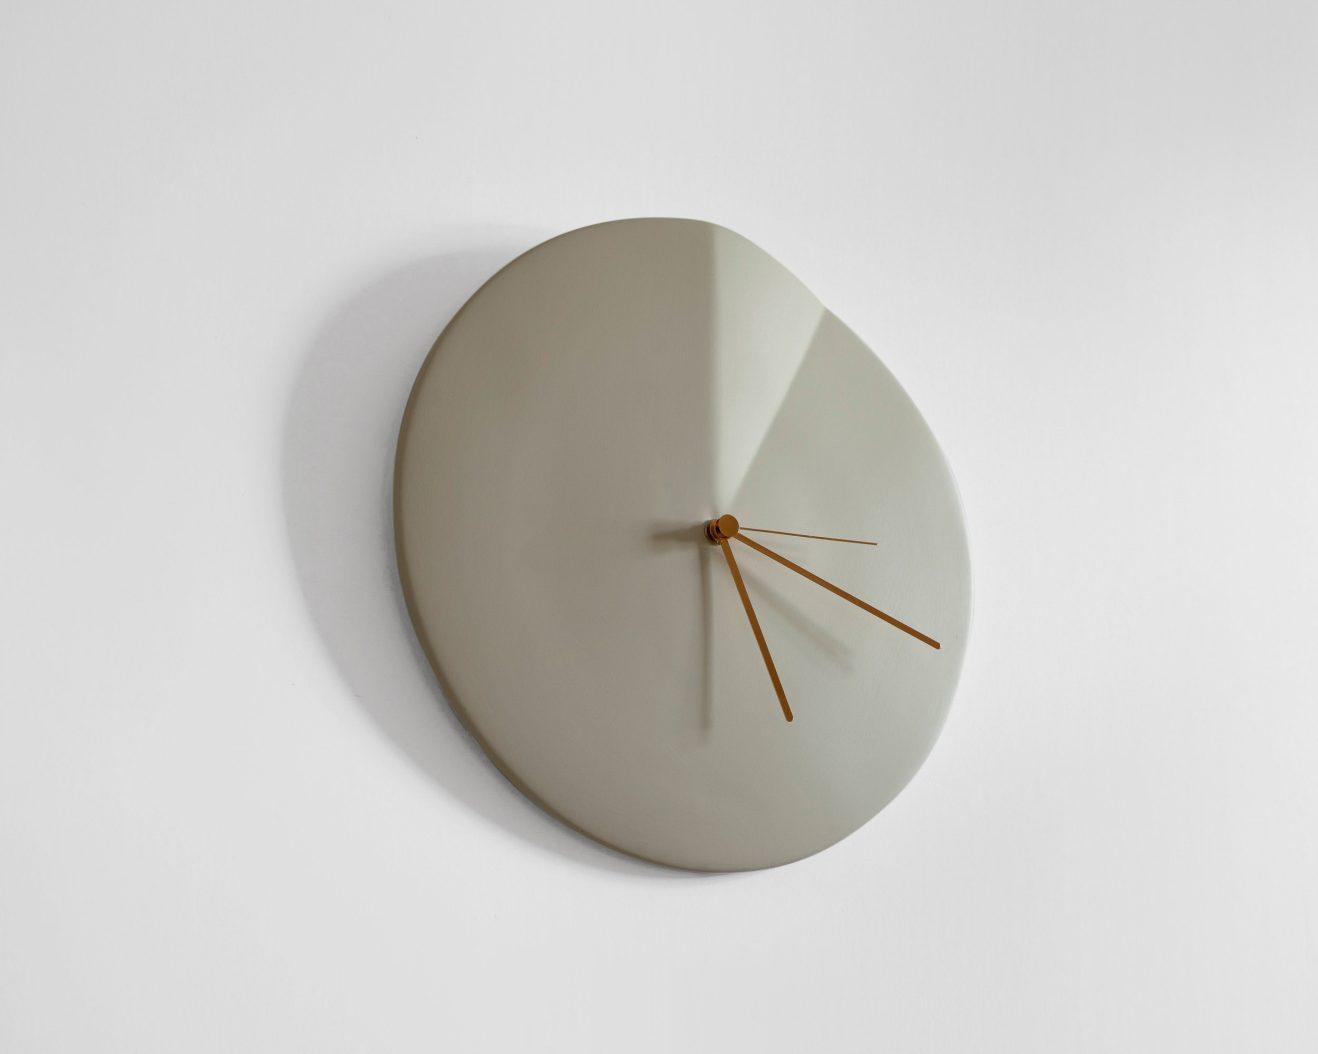 Horloge murale Oree par Ocrùm 1